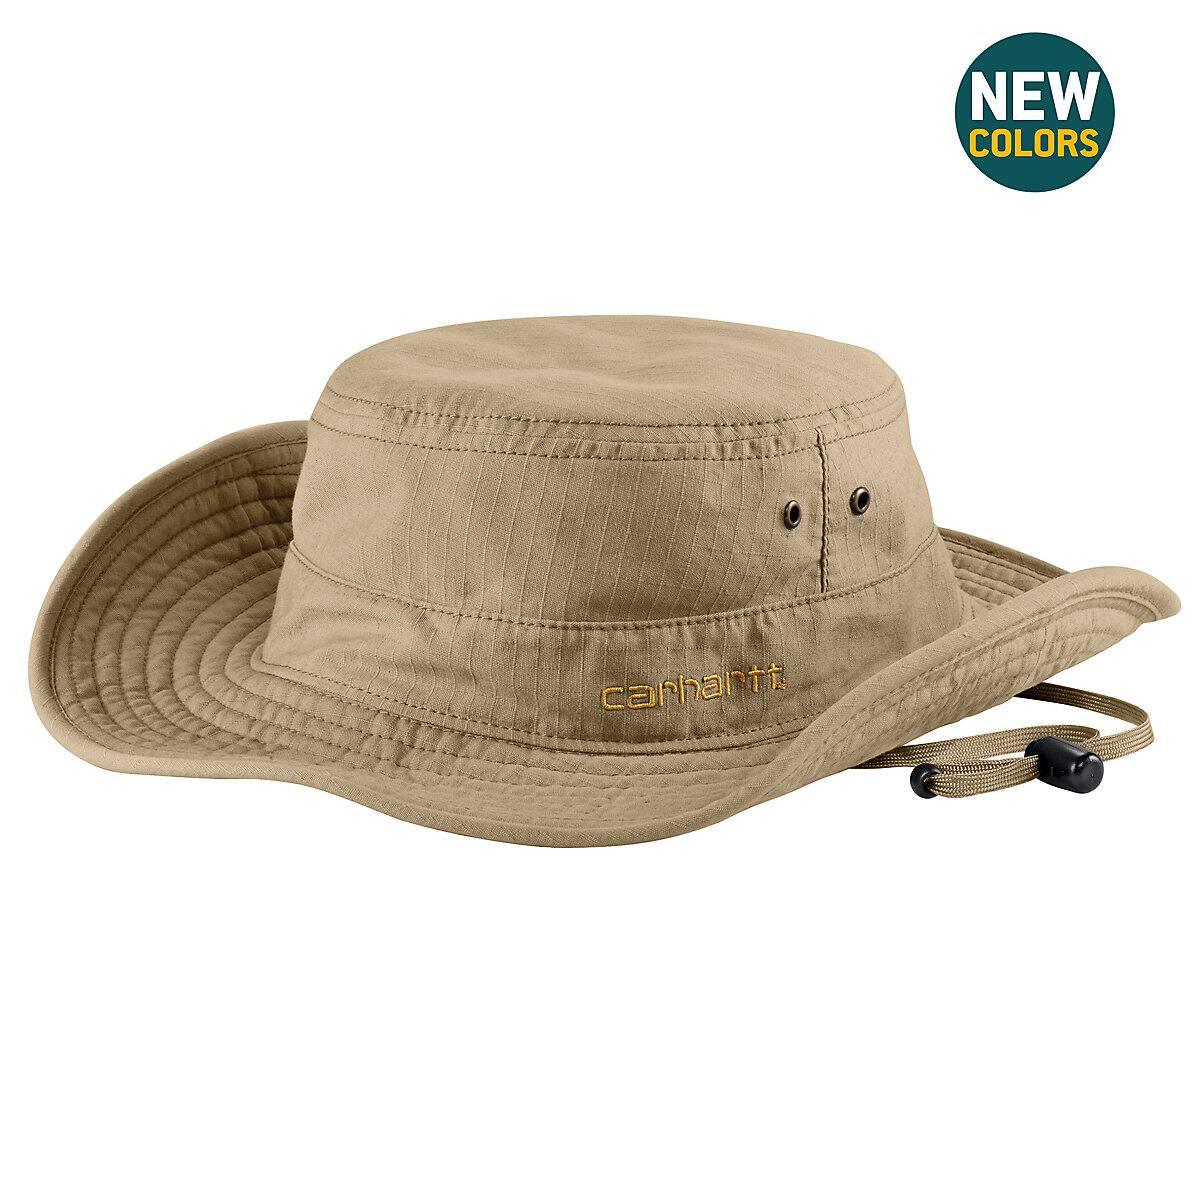 74cfc673761 Men s Billings Hat 101199